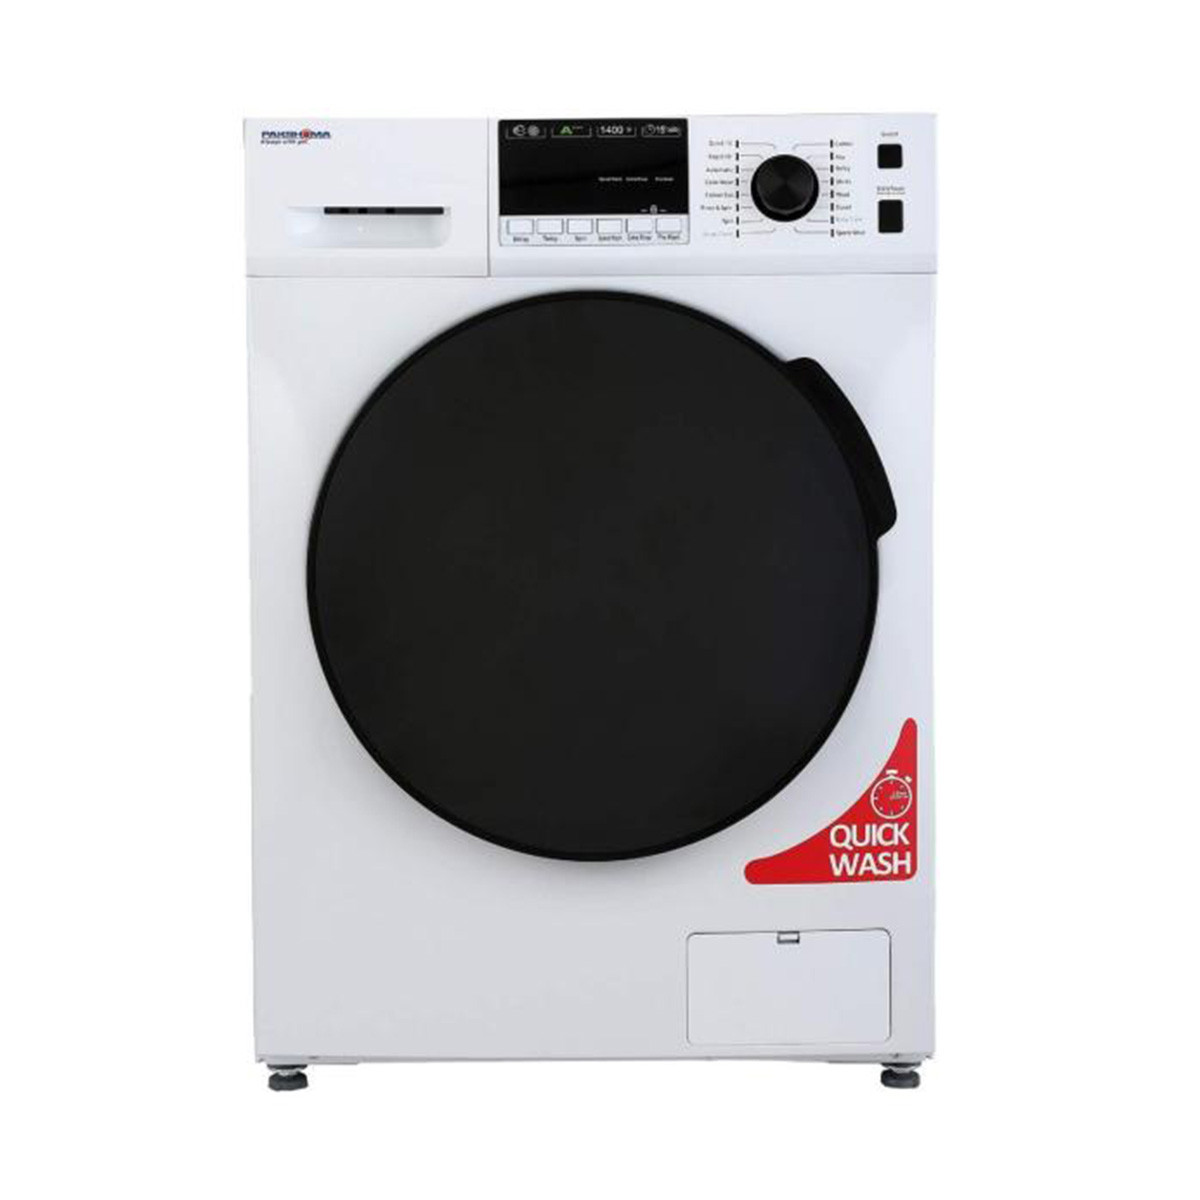 main images ماشین لباسشویی درب از جلو پاکشوما Pakshoma TFU-74401-7Kg